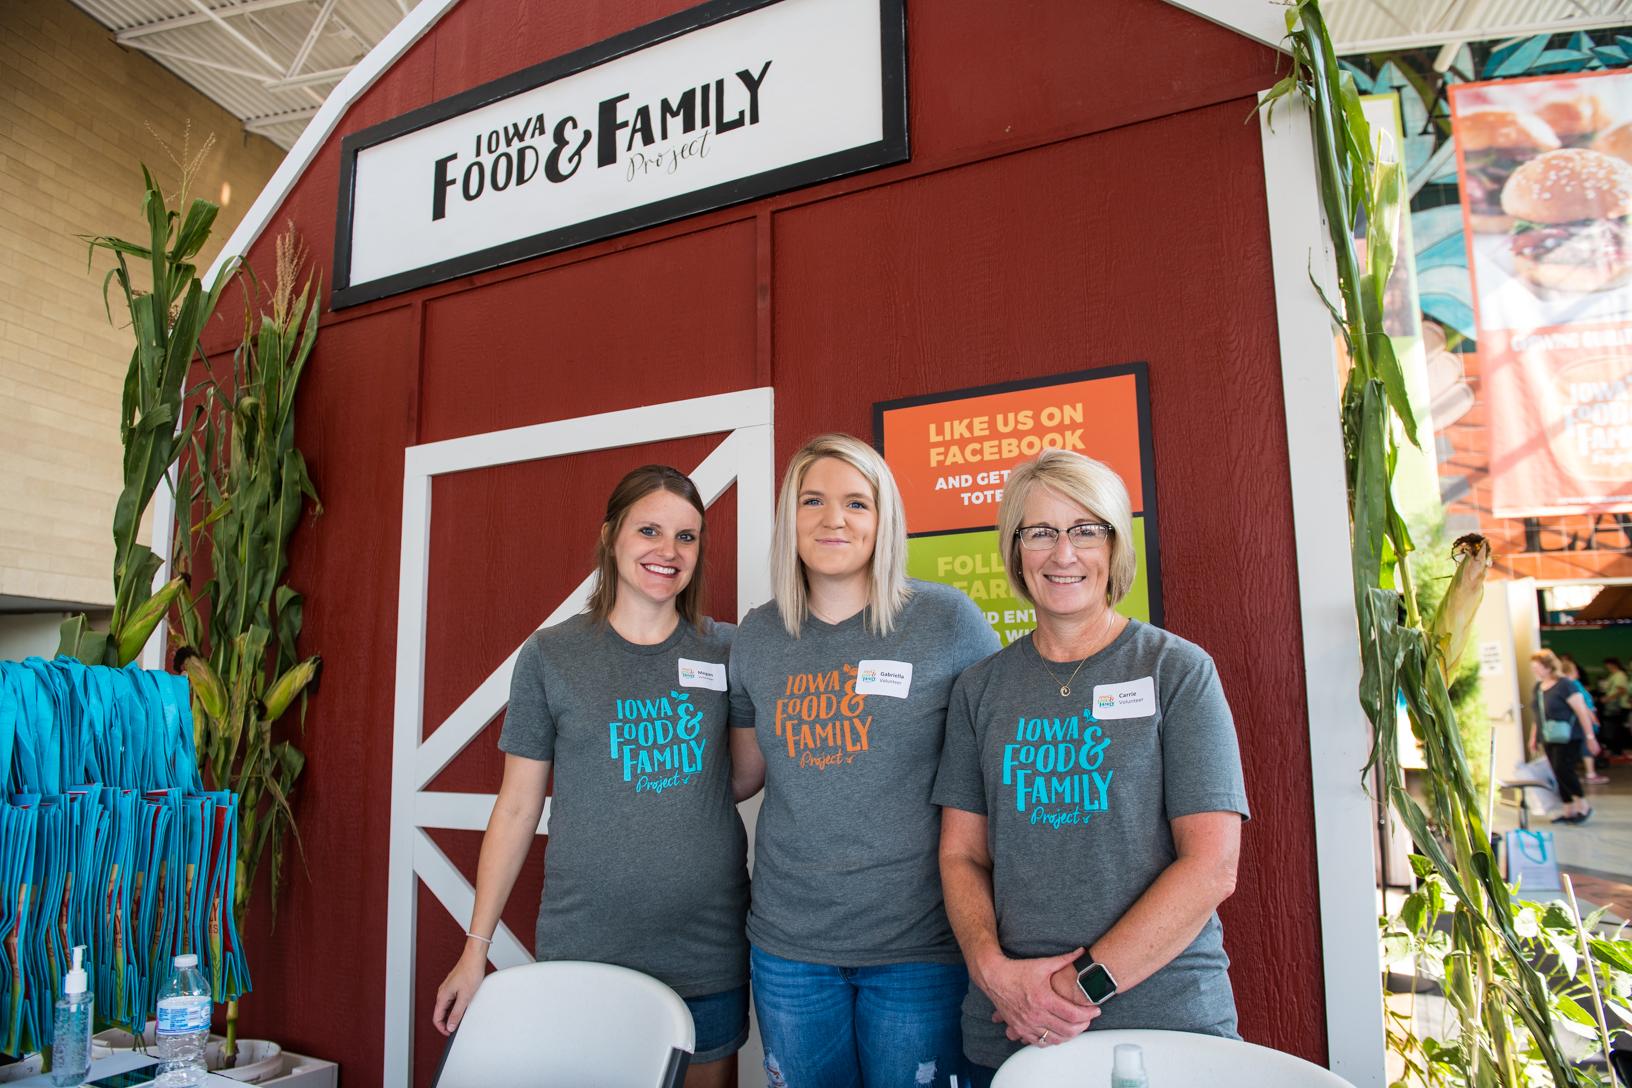 Volunteers at the Iowa FFP Iowa State Fair display. Photo credit: Joseph L. Murphy/Iowa Soybean Association